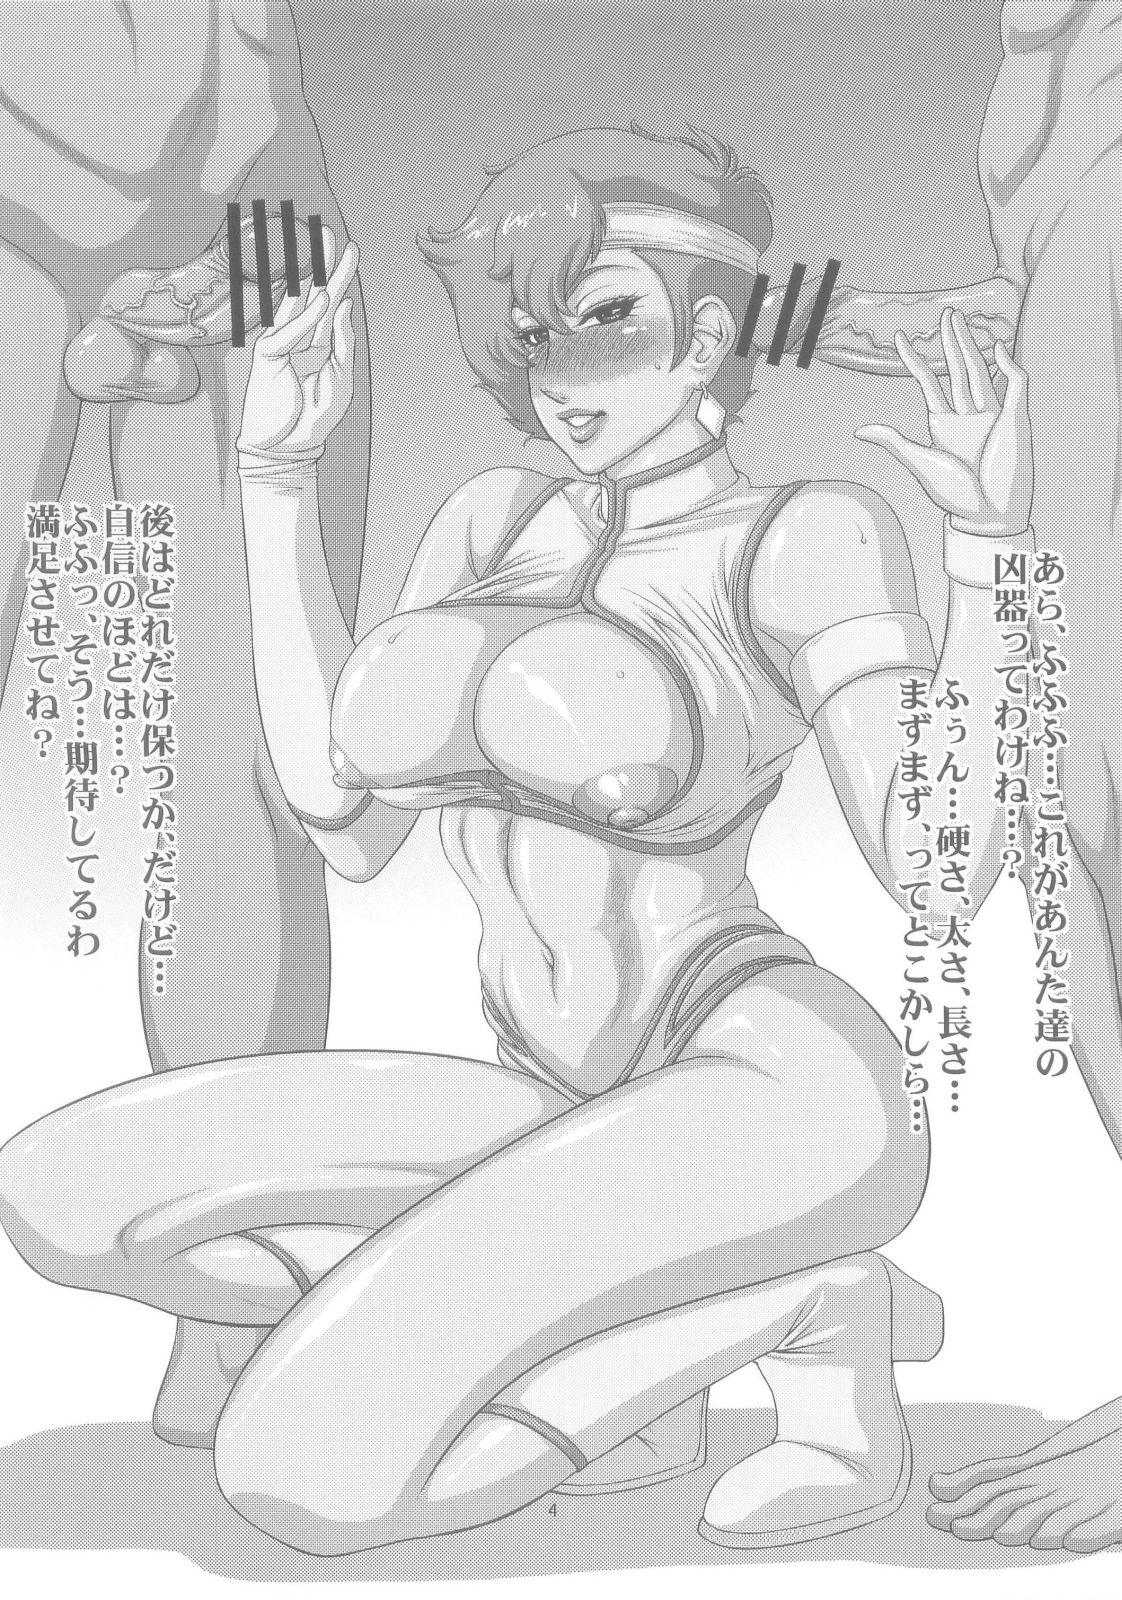 (C83) [Kikumizuan (Kikumizu Shouichi)] Lovely Erotics ~ K*i no Baai ~   Lovely Erotics -The Case of K*i- (Dirty Pair) 5